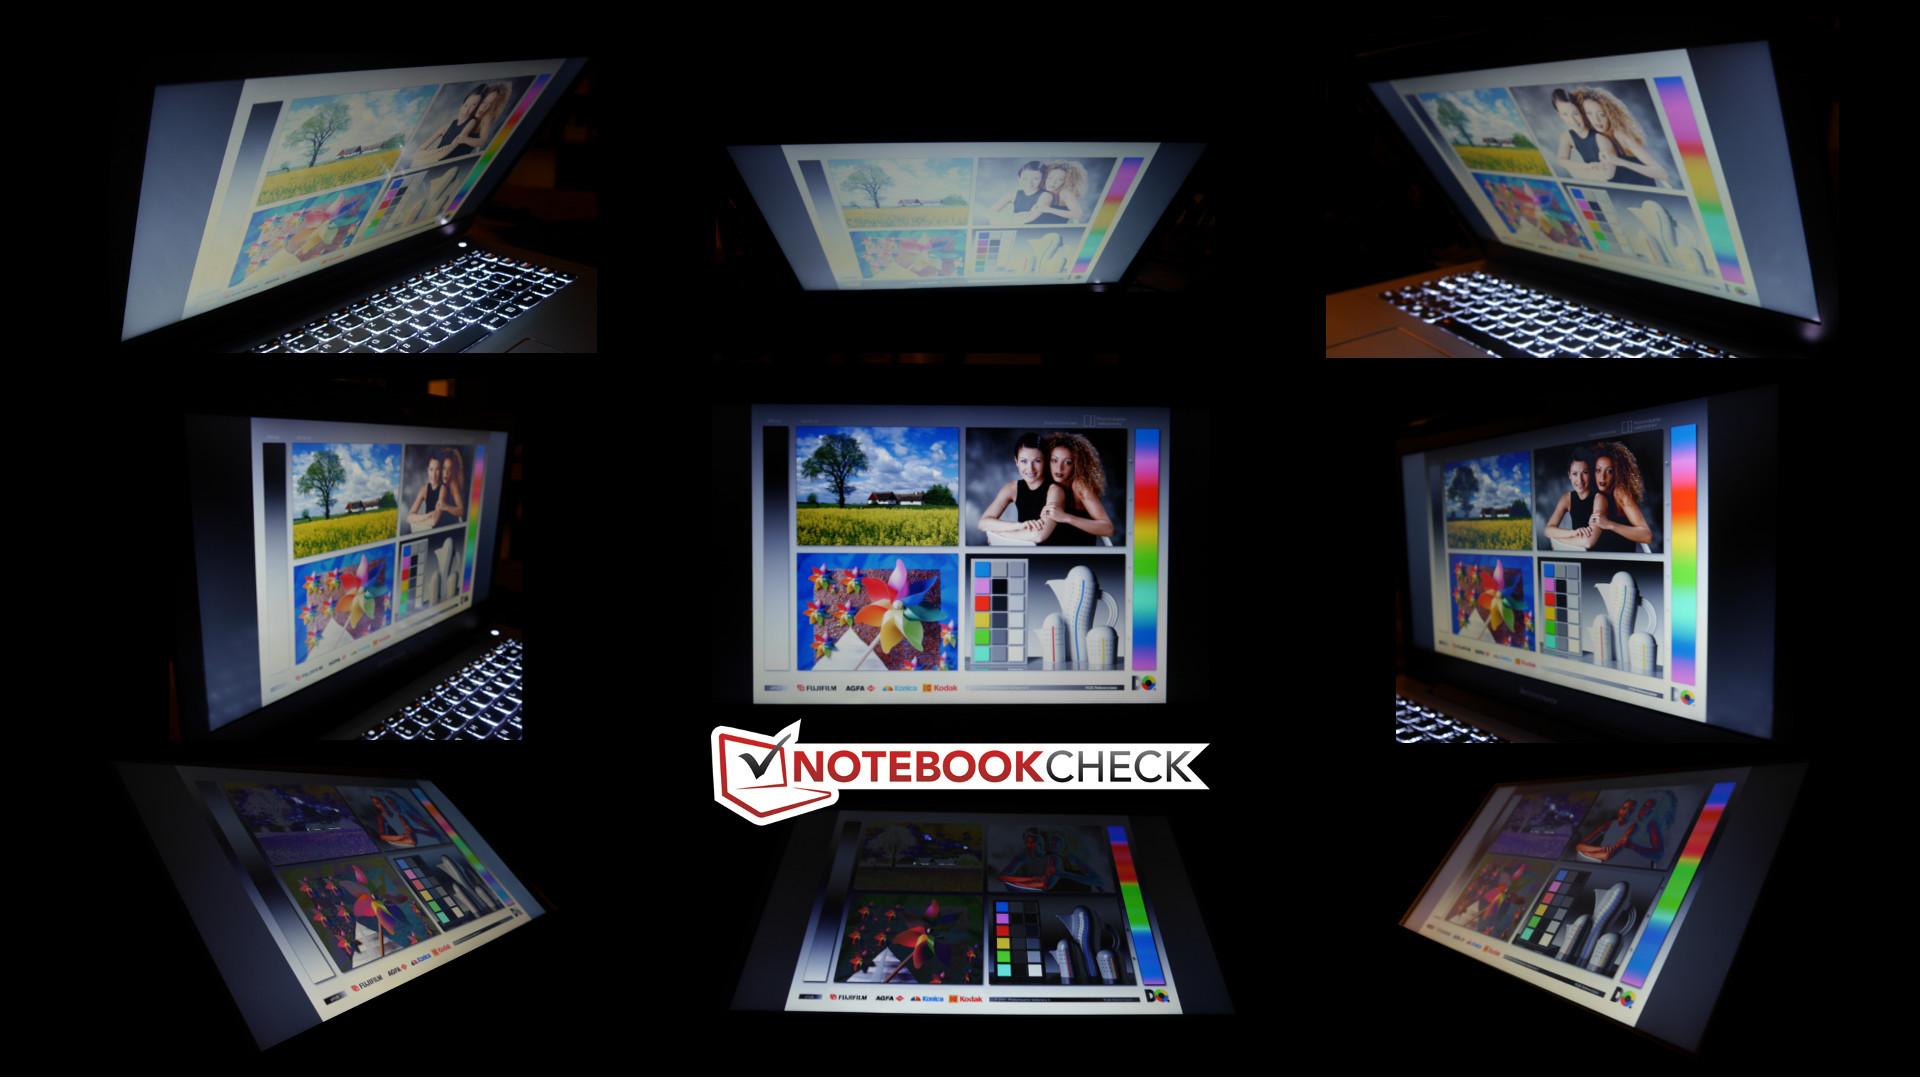 http://www.notebookcheck.net/fileadmin/Notebooks/Lenovo/U41-70/blickwinkel.jpg